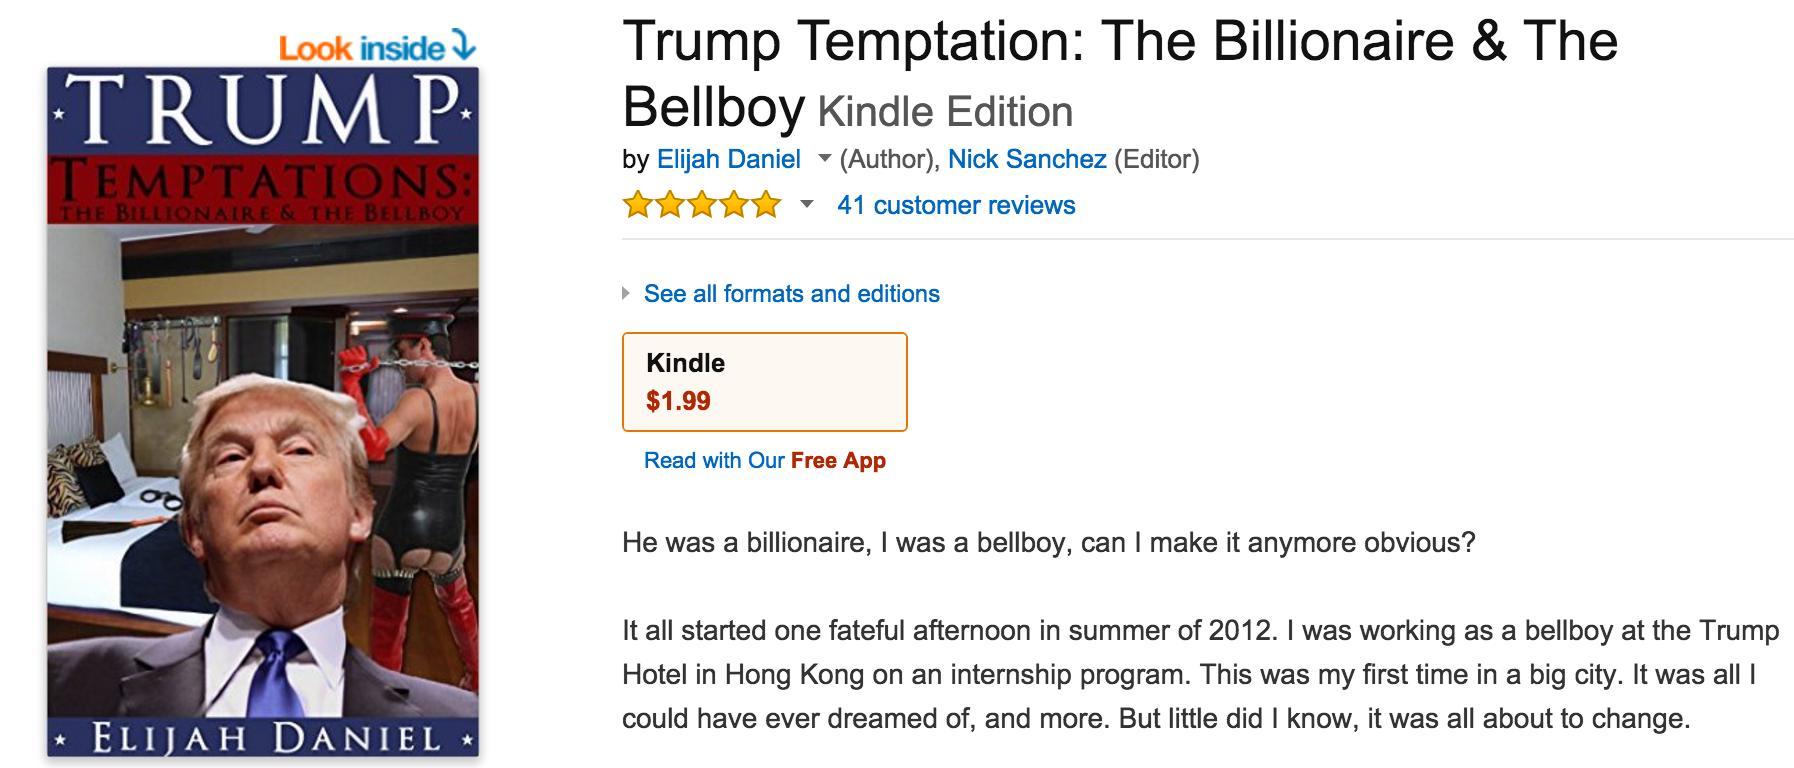 Donald Trump Erotic Novel Amazon